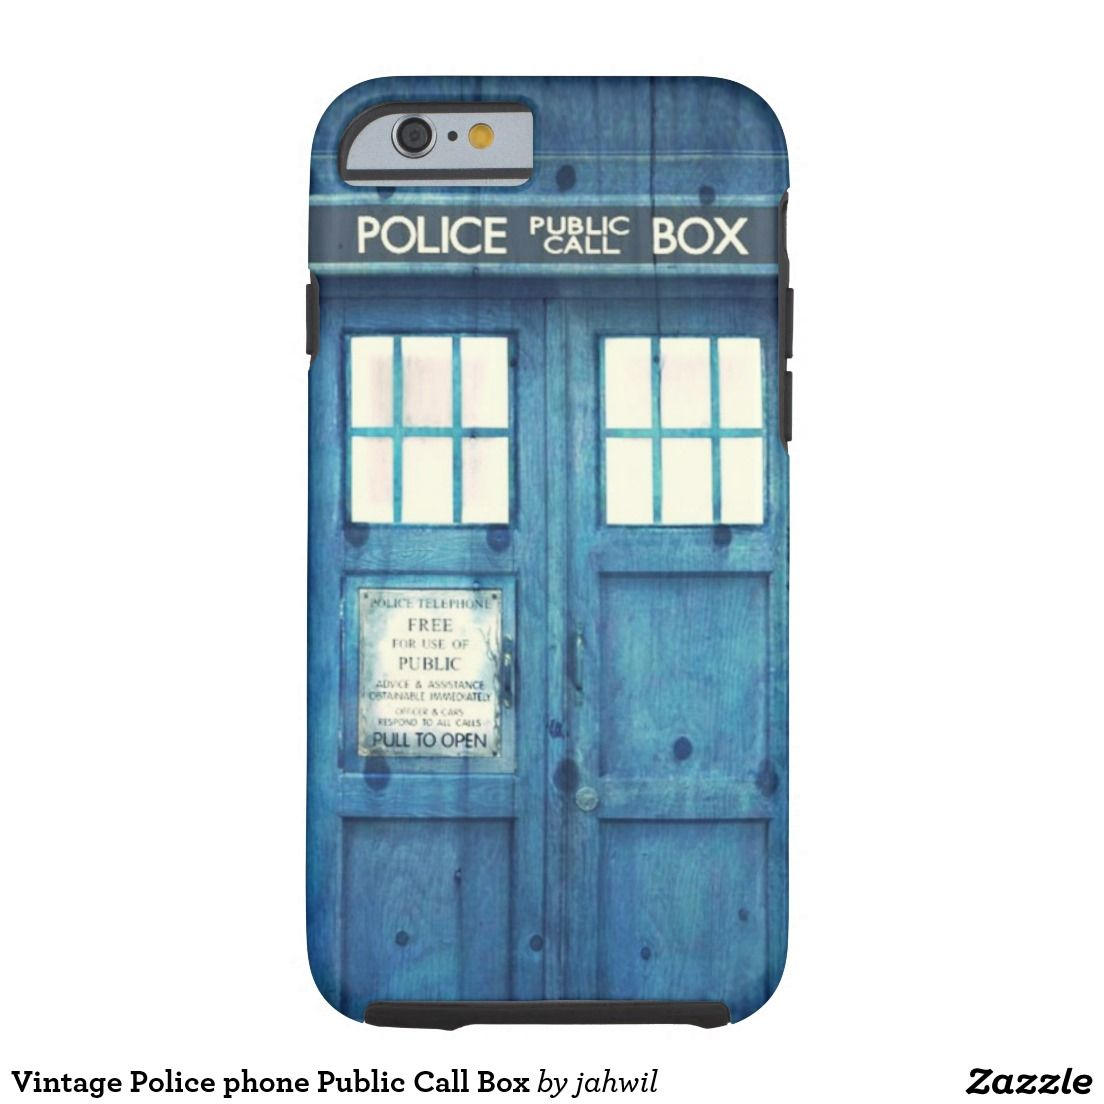 Vintage Police phone Public Call Box CaseMate iPhone Case